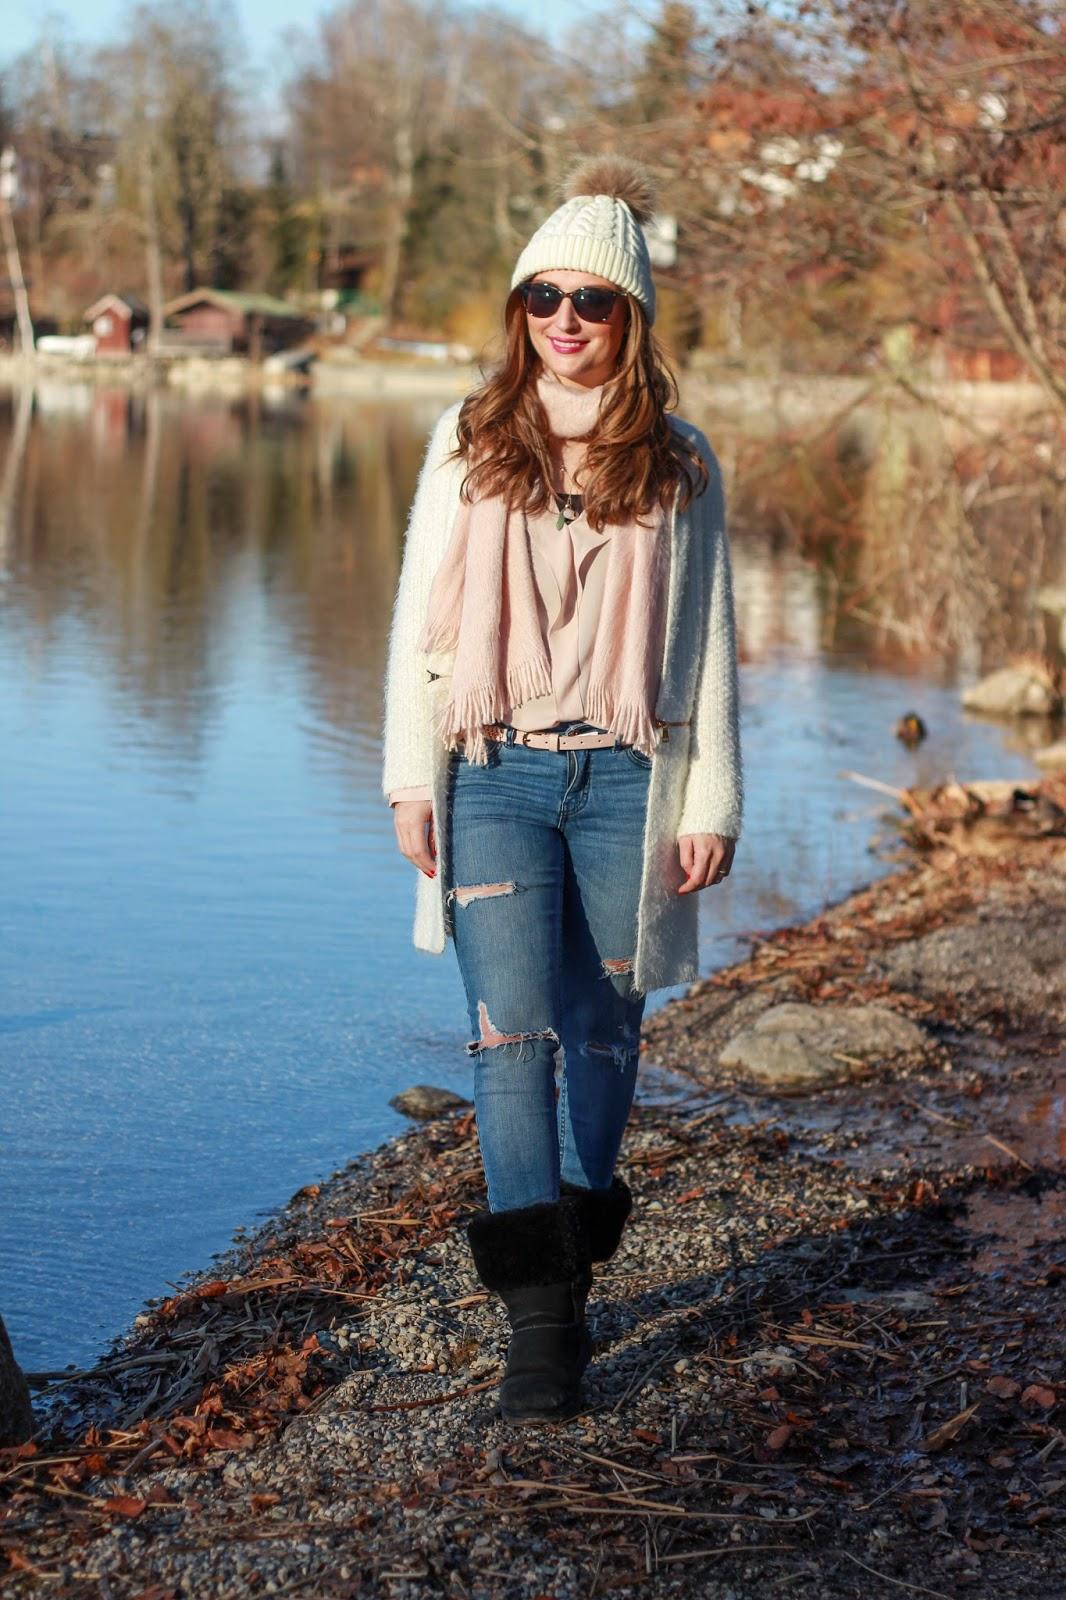 Ripped Jeans Inspiration - Fashionstylebyjohanna - Blogger aus Frankfurt - Fashion Inspiration - Outfit Inspiration